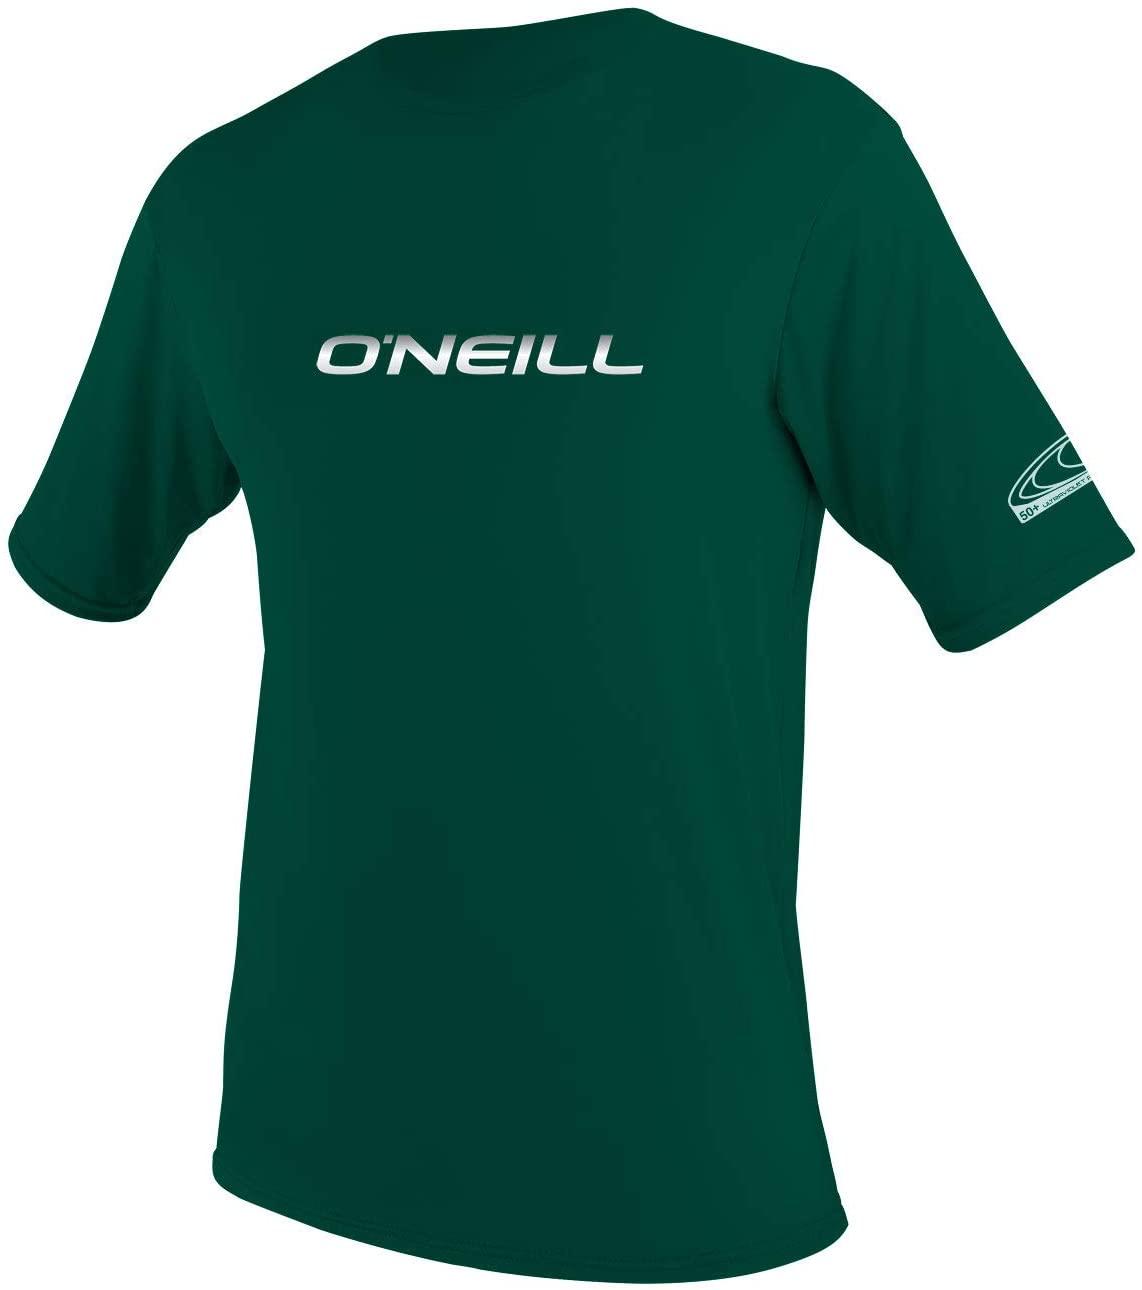 O'Neill Men's Basic Skins Slim Fit Rash Tee M Deep Green (3402IS)